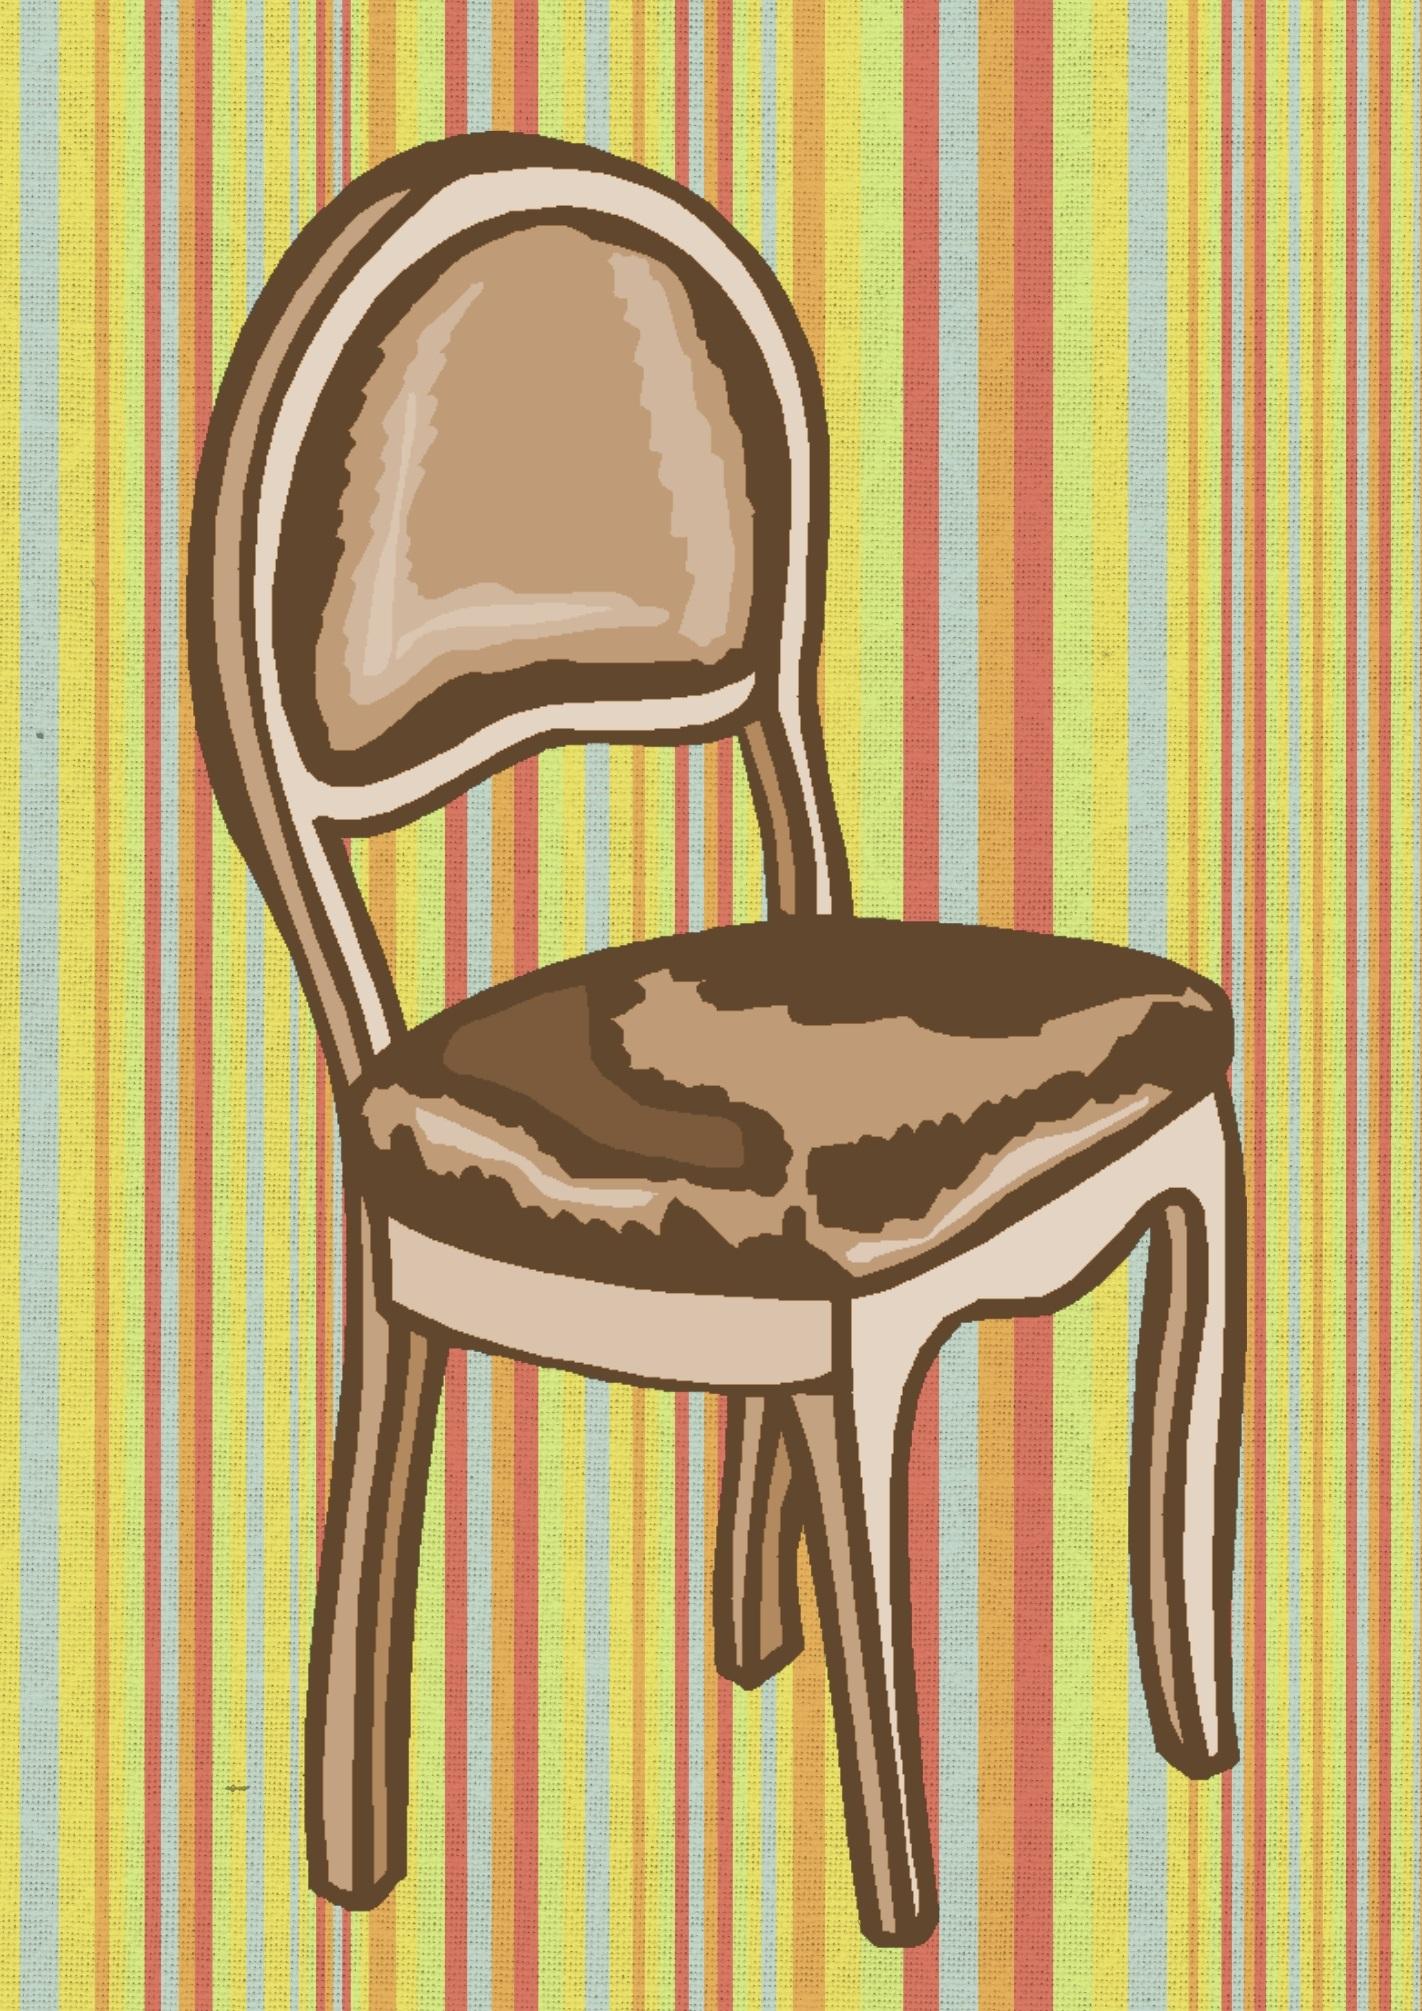 Brown Chair, Brown, Chair, Furniture, Graphics, HQ Photo